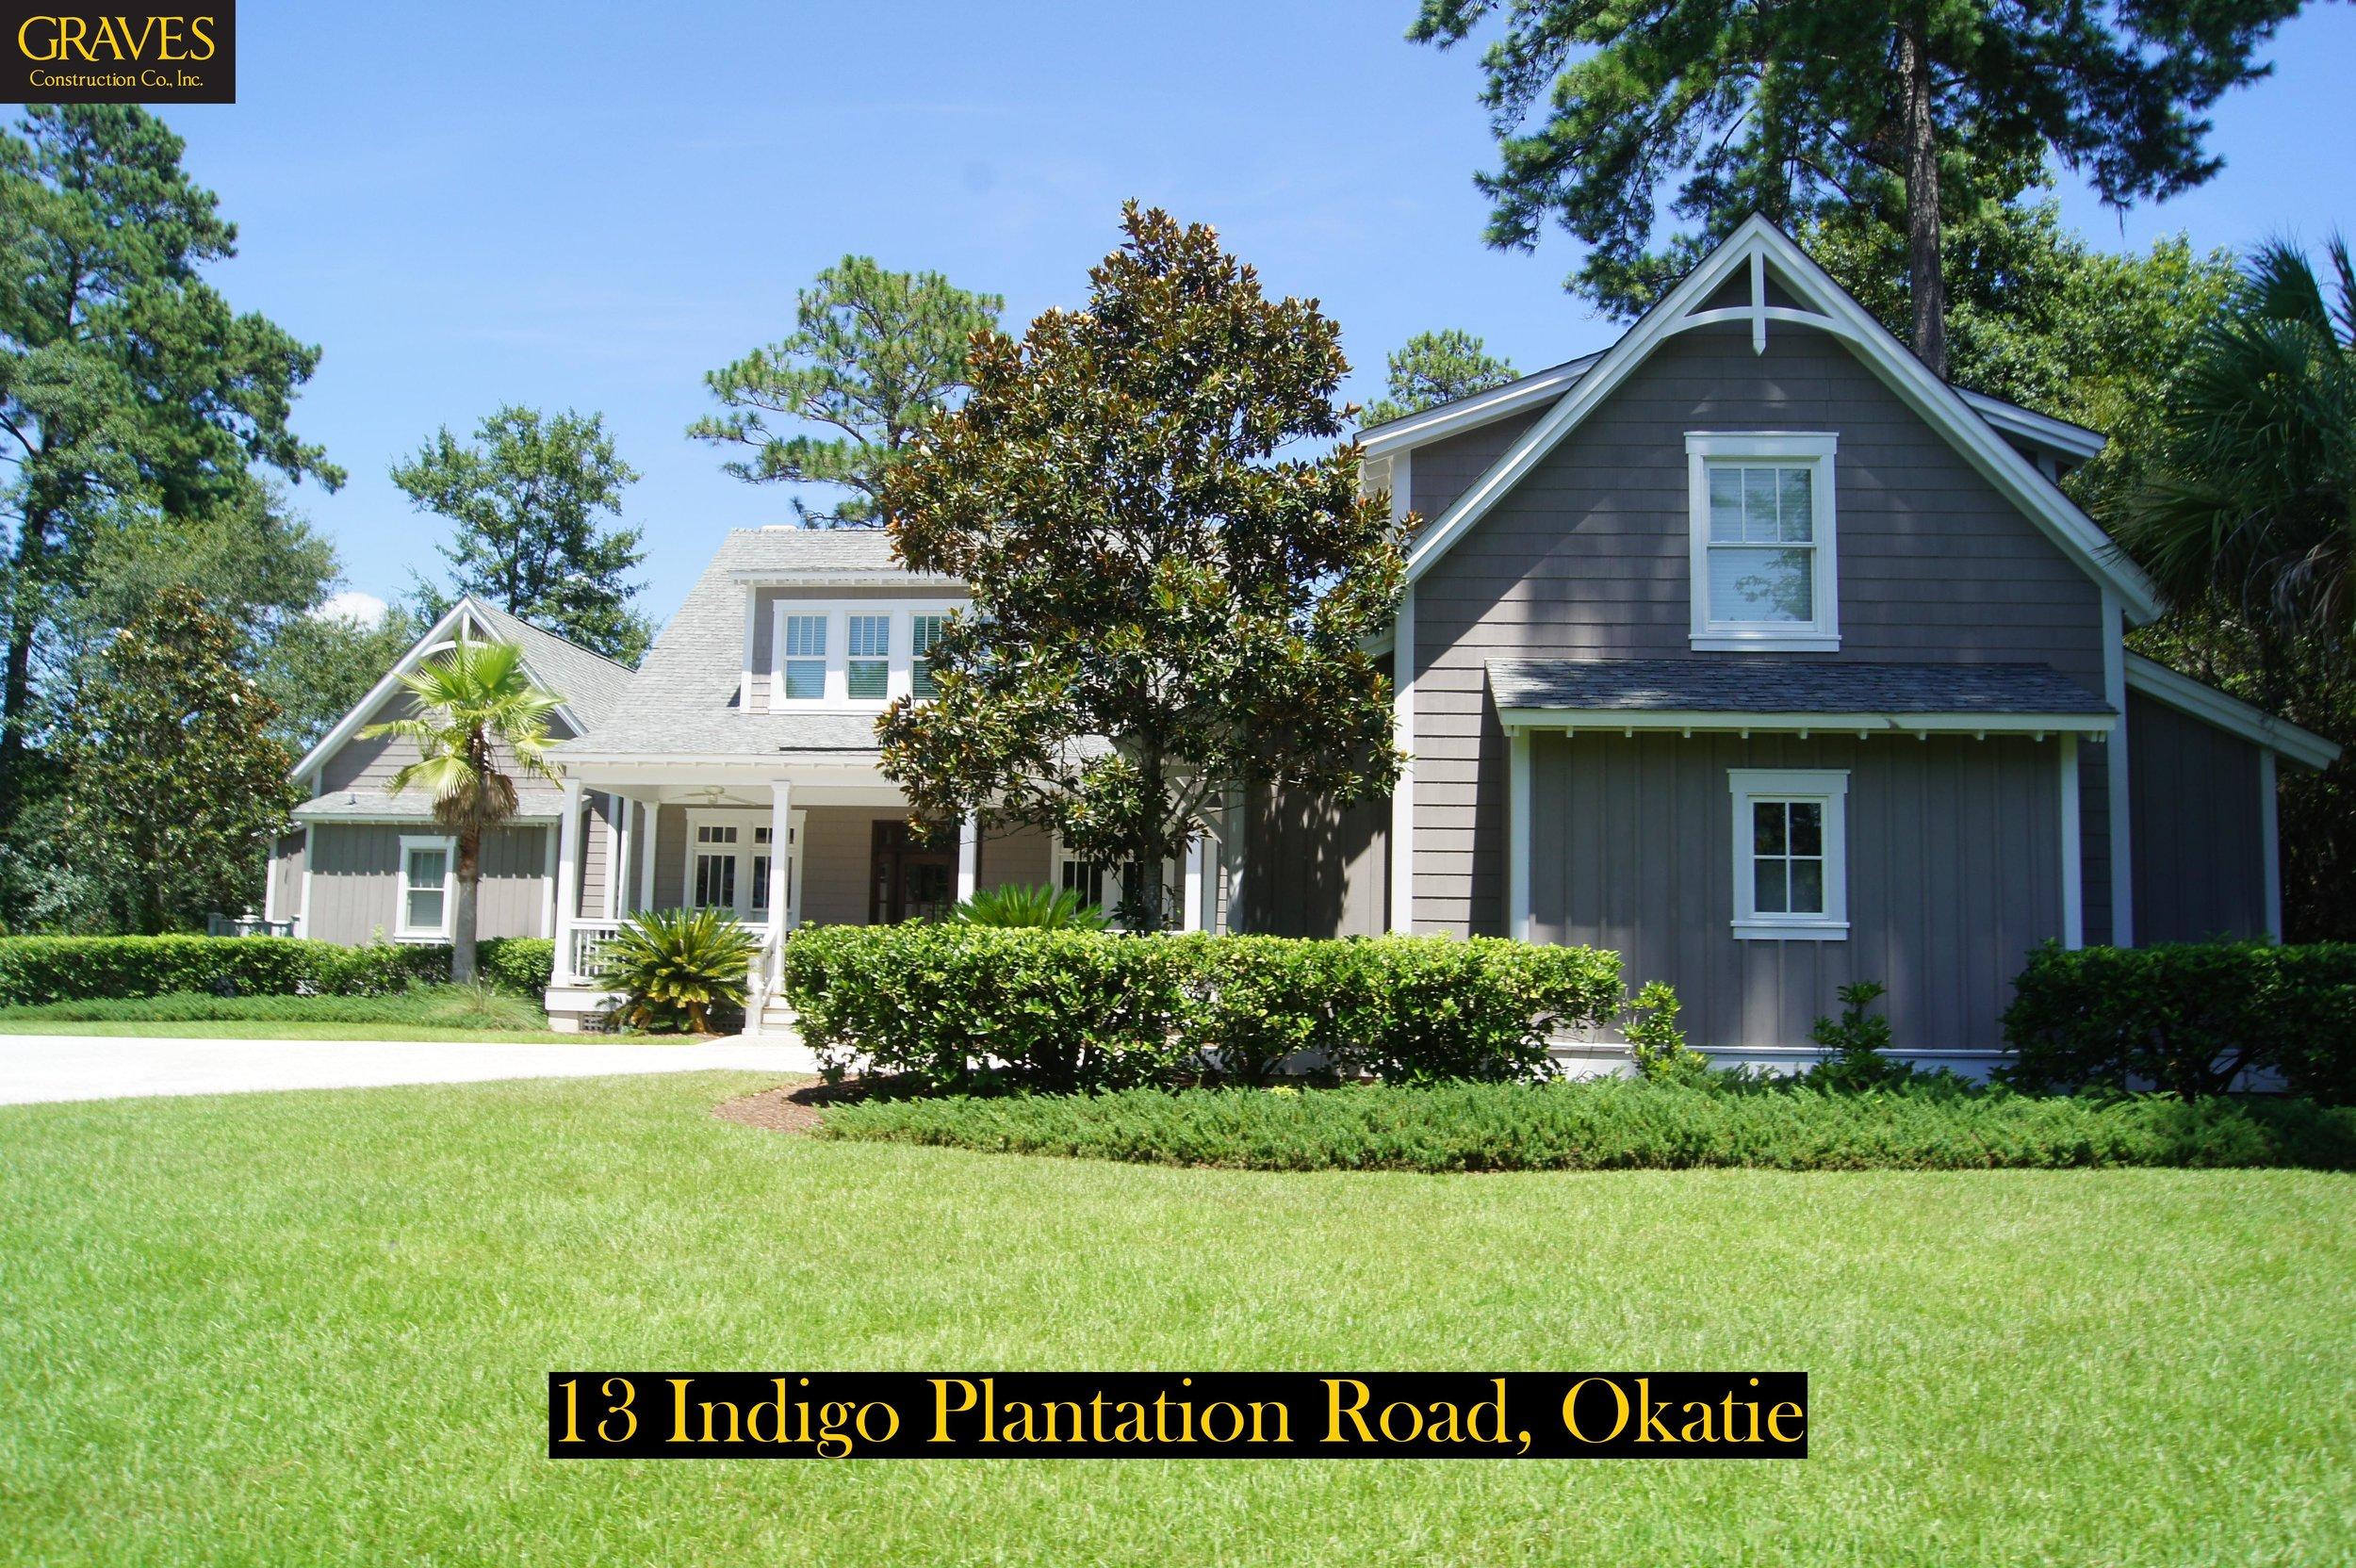 13 Indigo Plantation Rd - 2